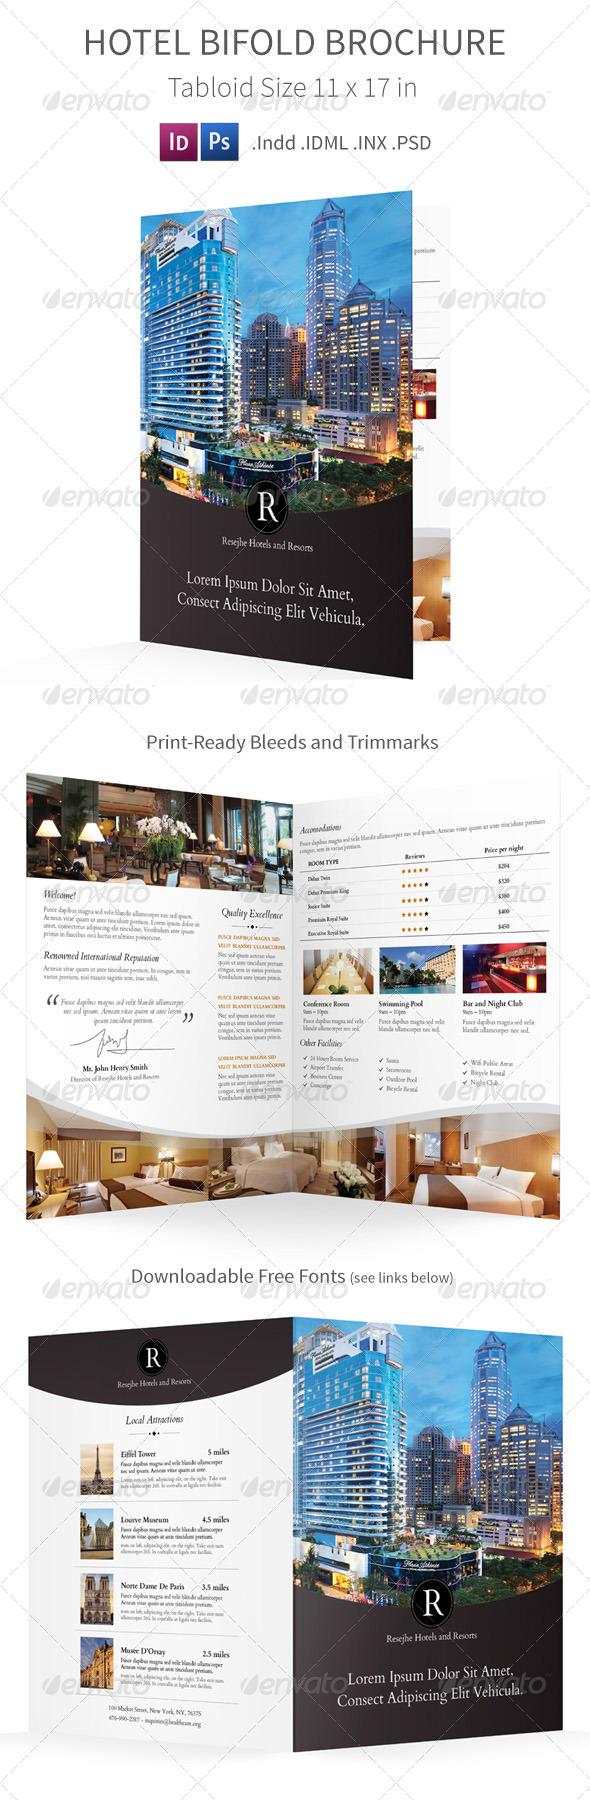 GraphicRiver Hotel Bifold Halffold Brochure 7843783